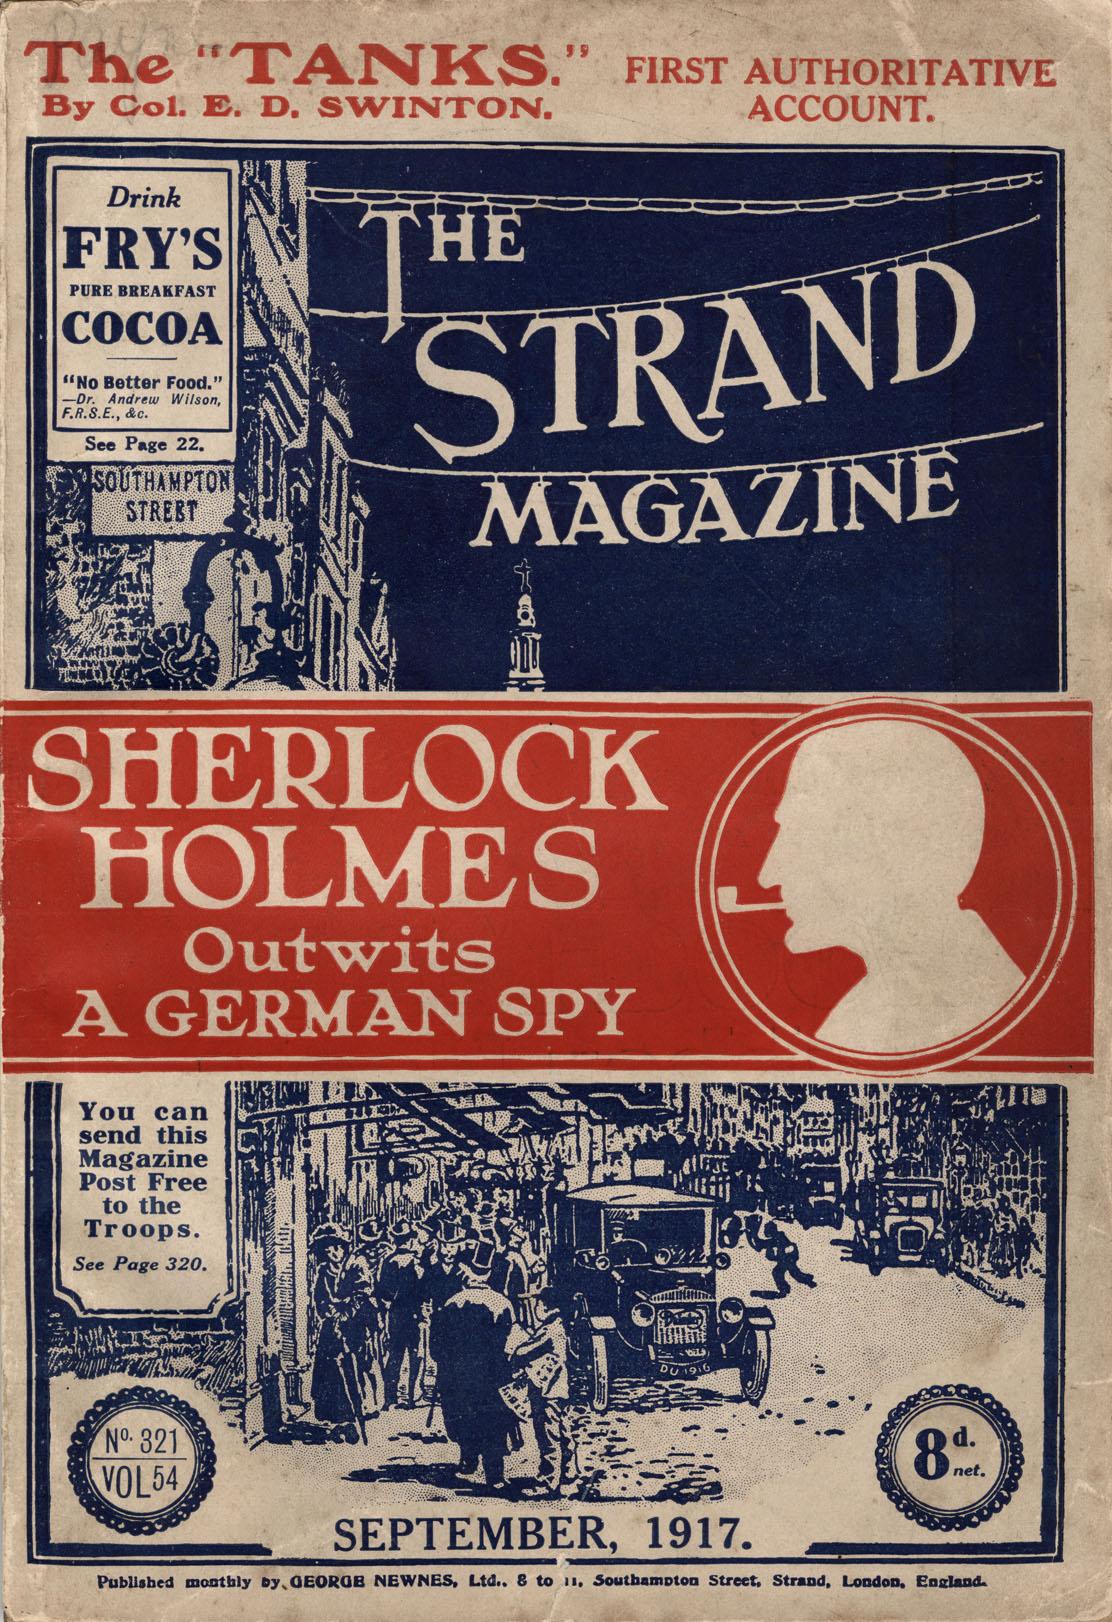 The Strand Magazine (cover), vol. 65, no. 321, September 1917.jpg